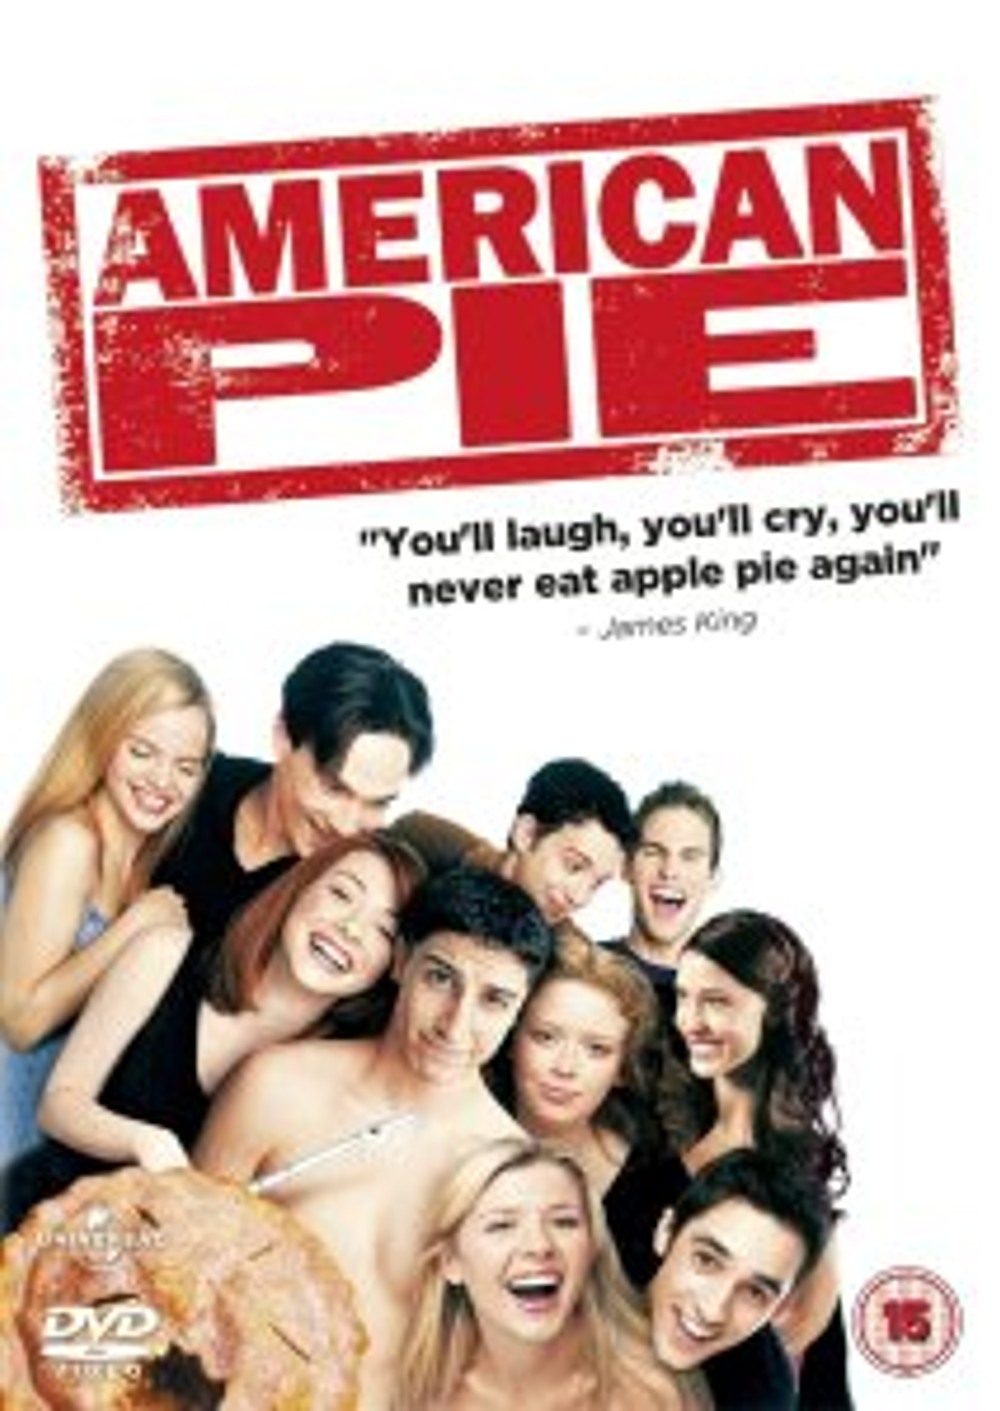 Image: American Pie